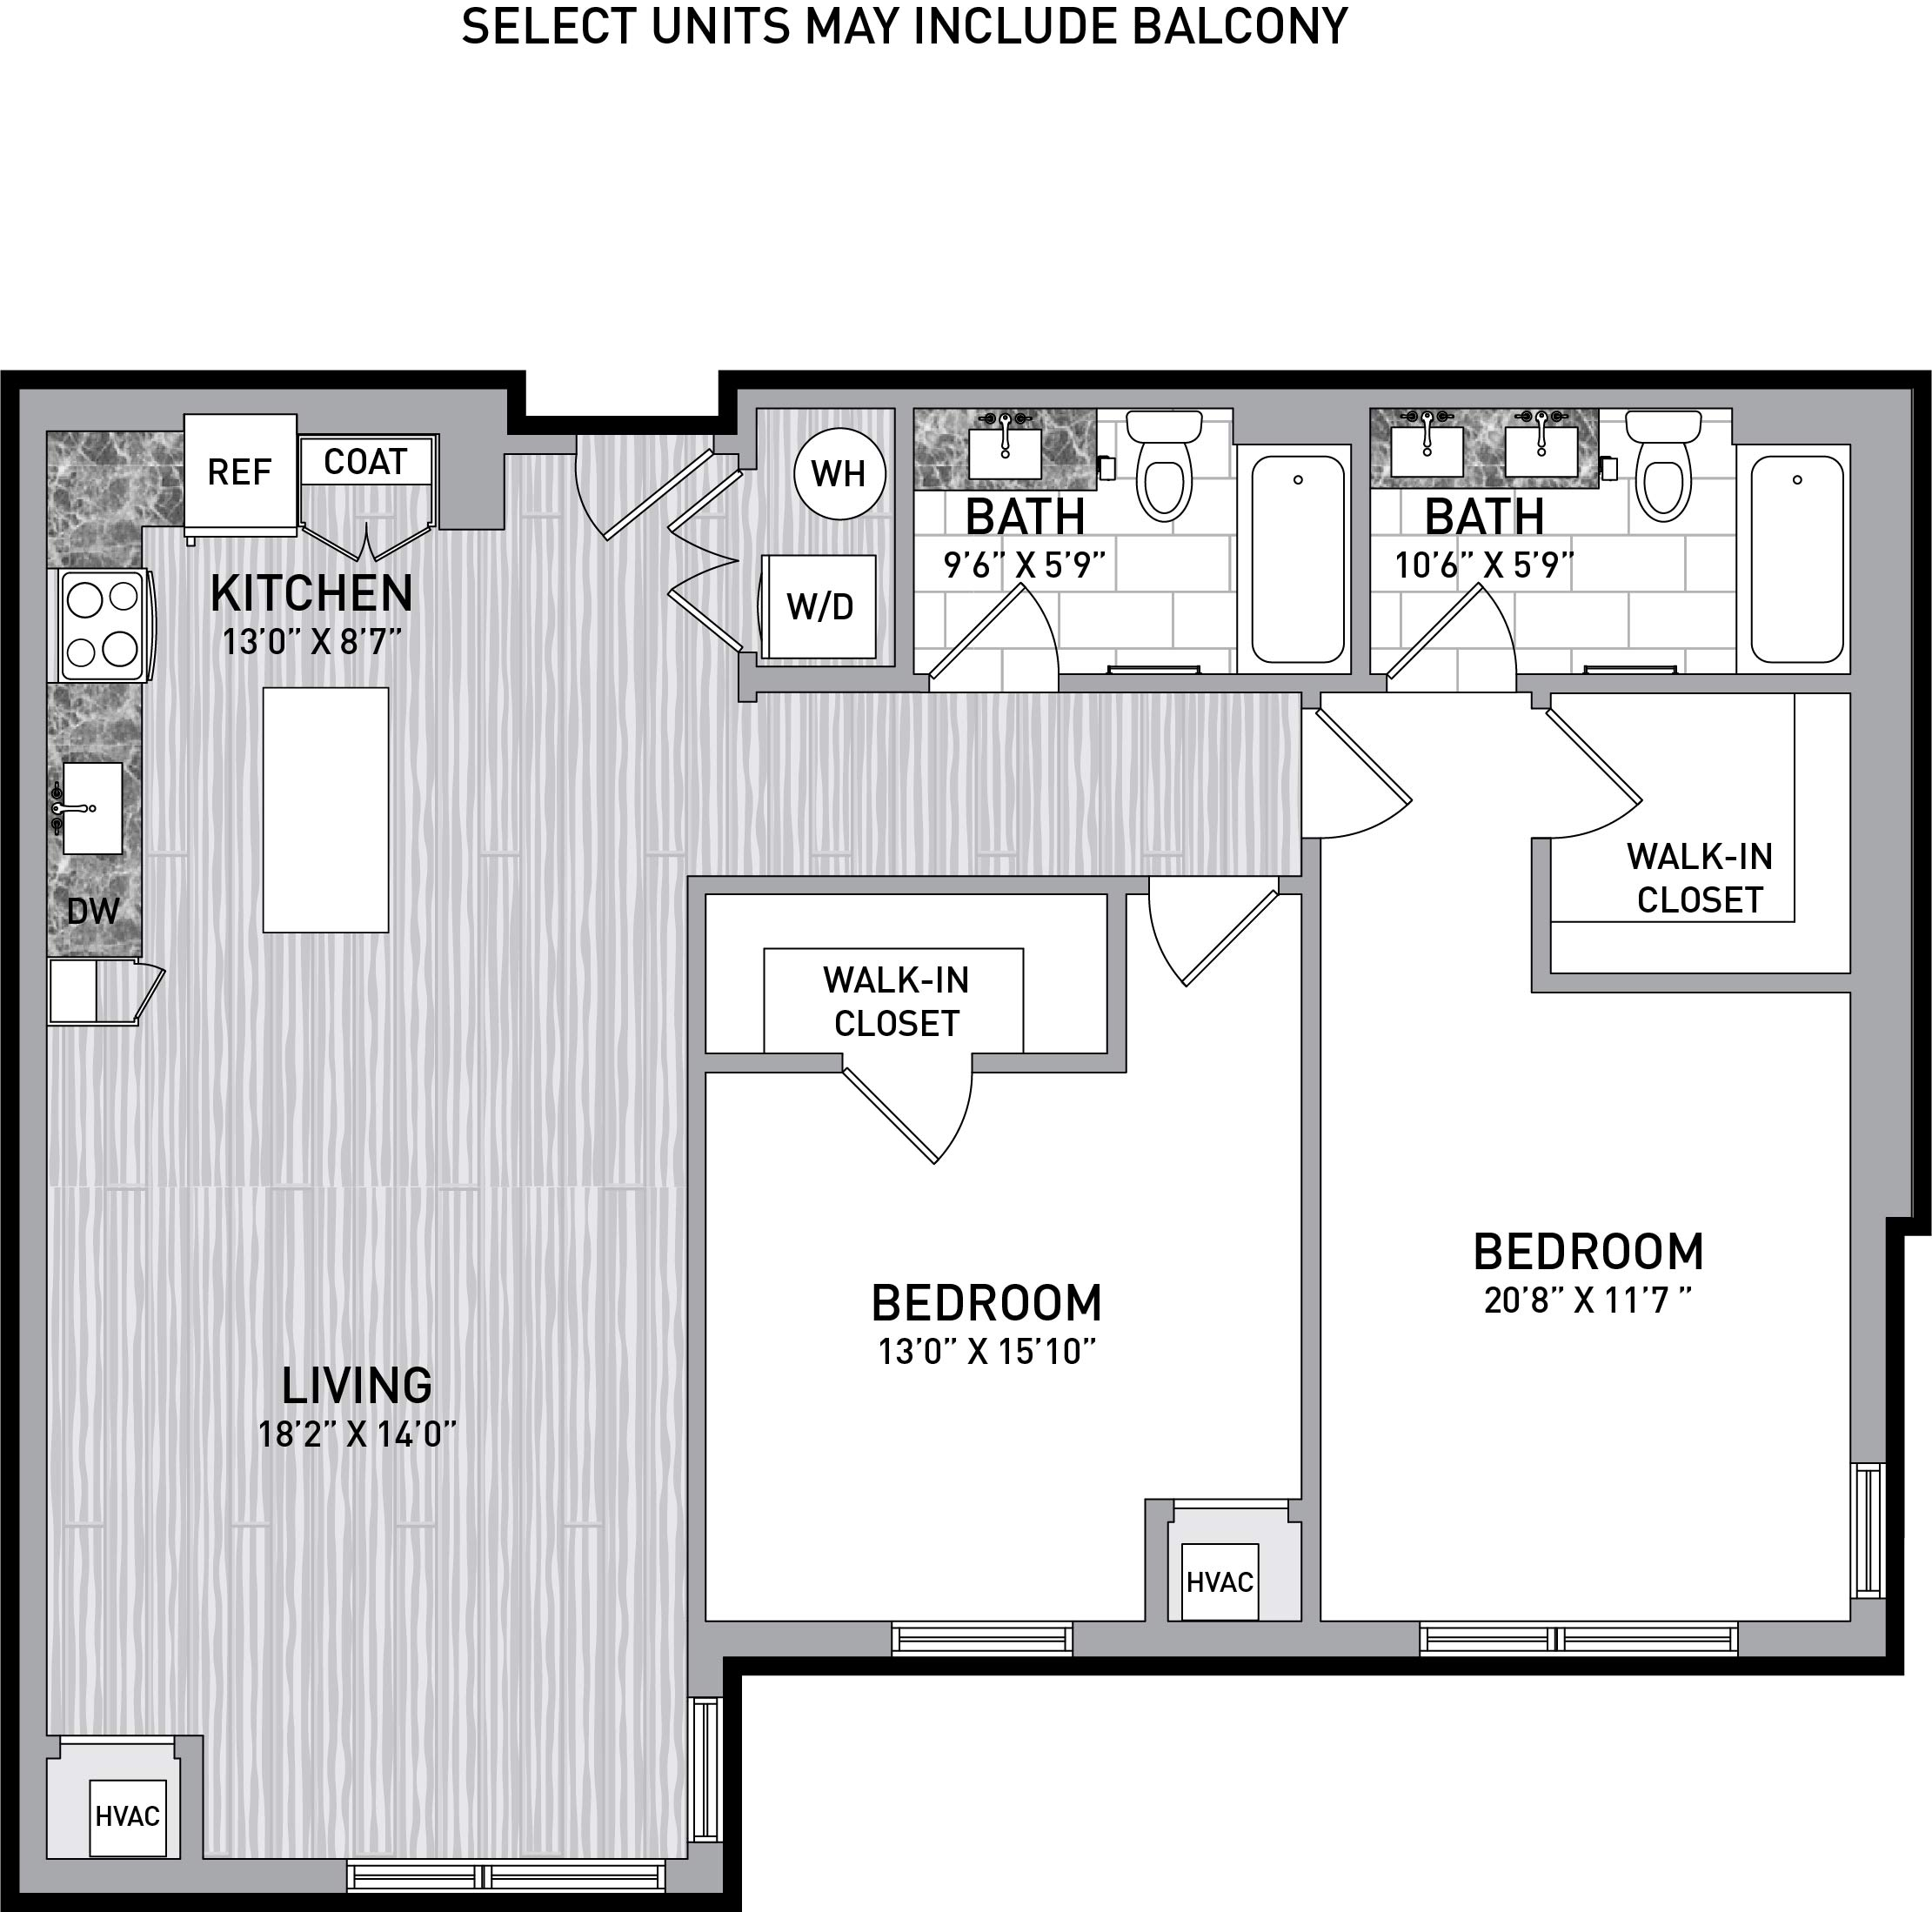 112 floorplan